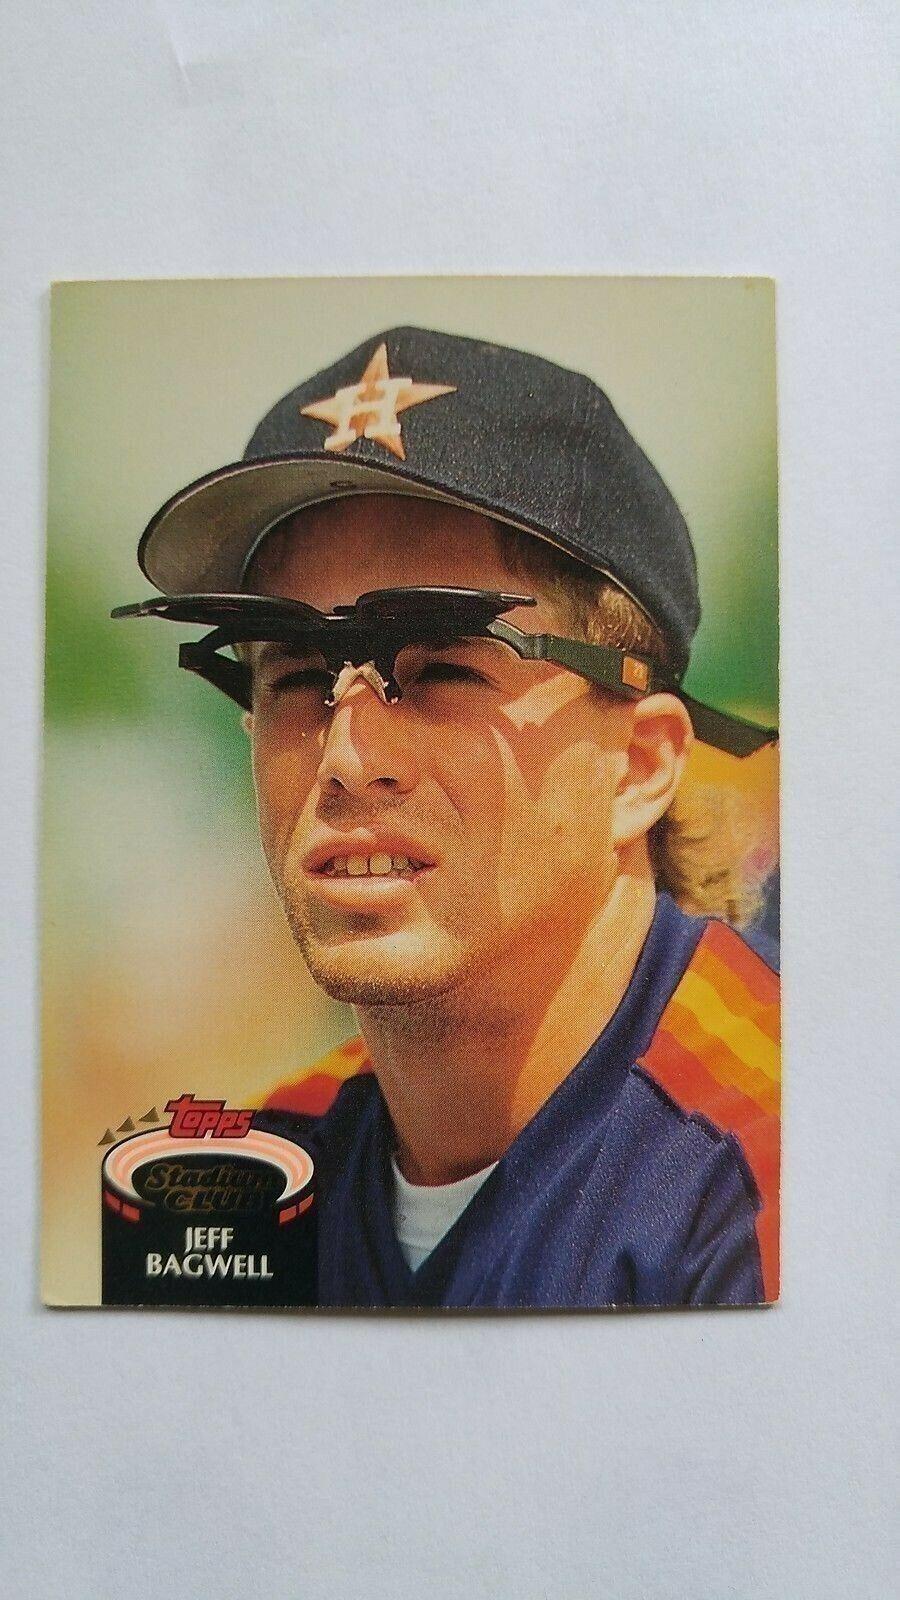 Jeff Bagwell 1992 Topps Stadium Club Card #330 Houston Astros Free Shipping